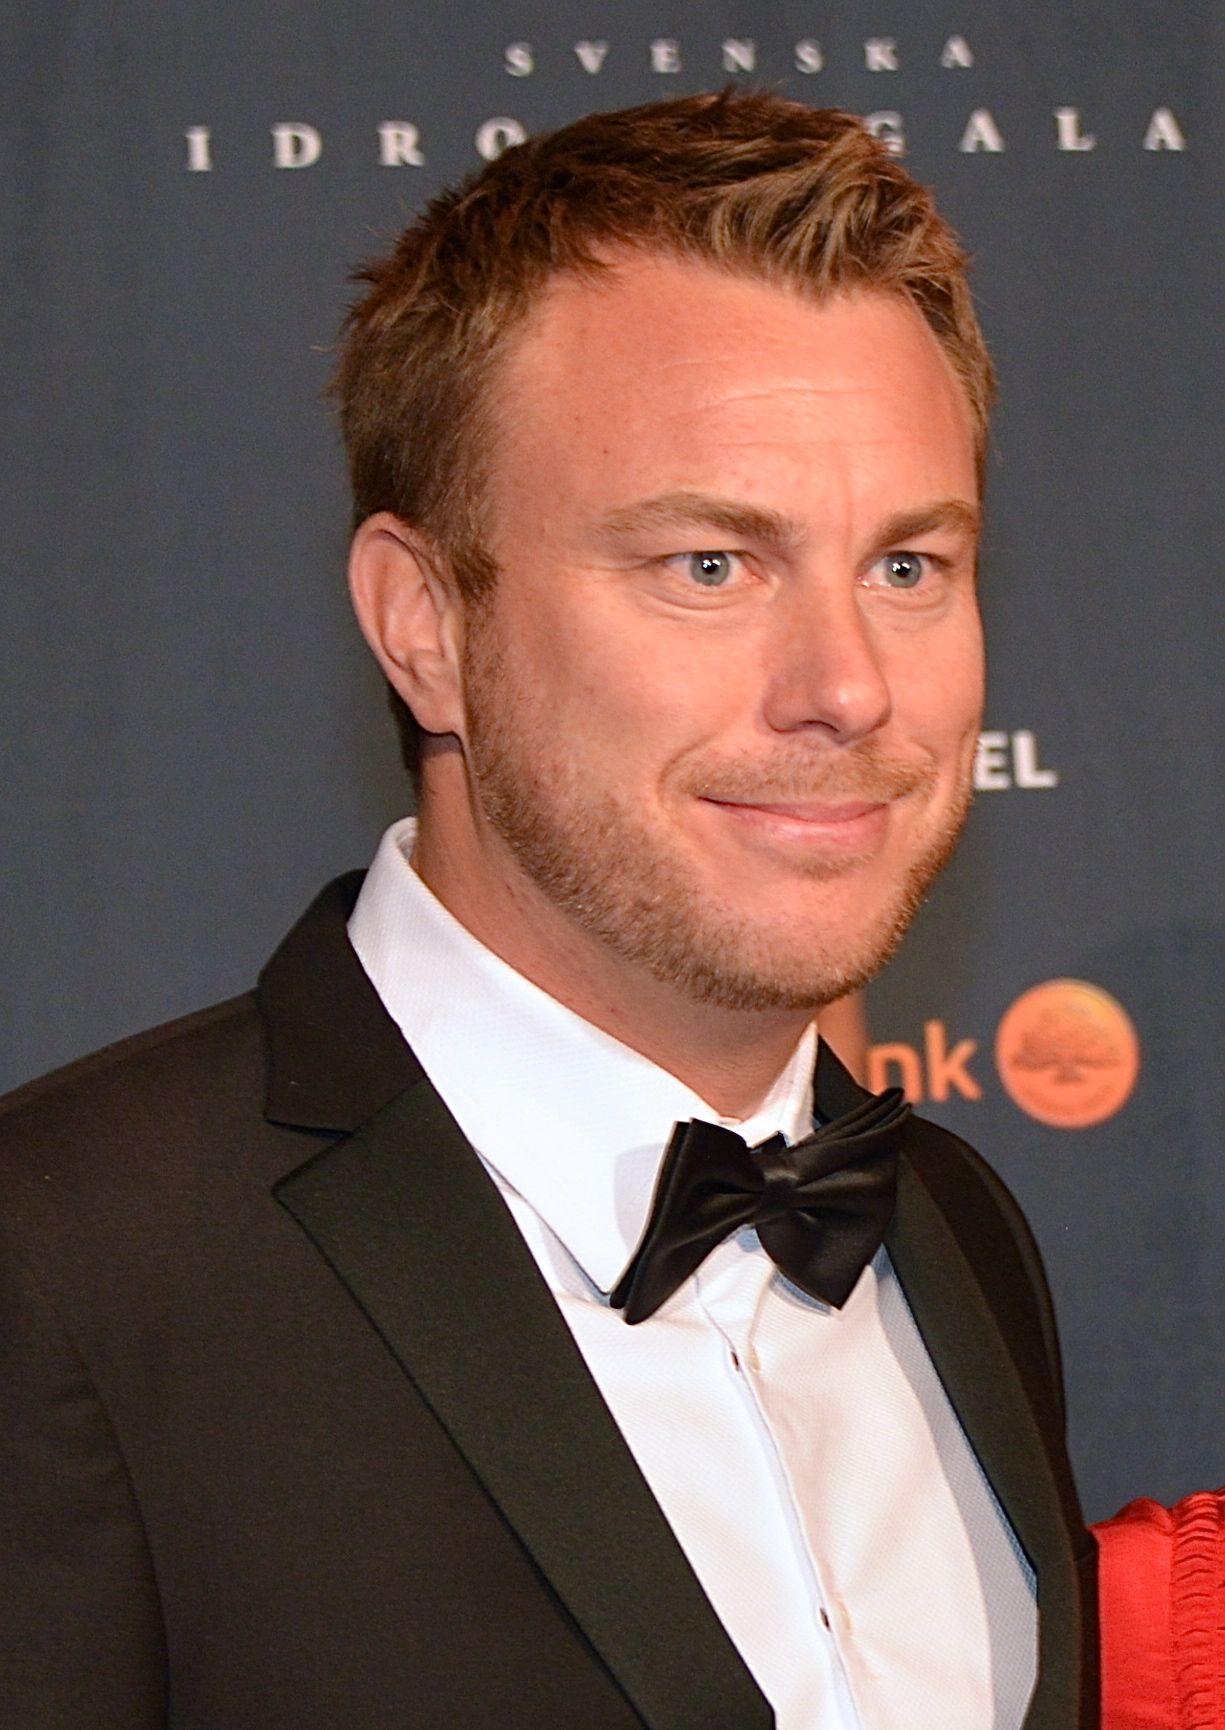 Jonas Karlsson Swedish Actor